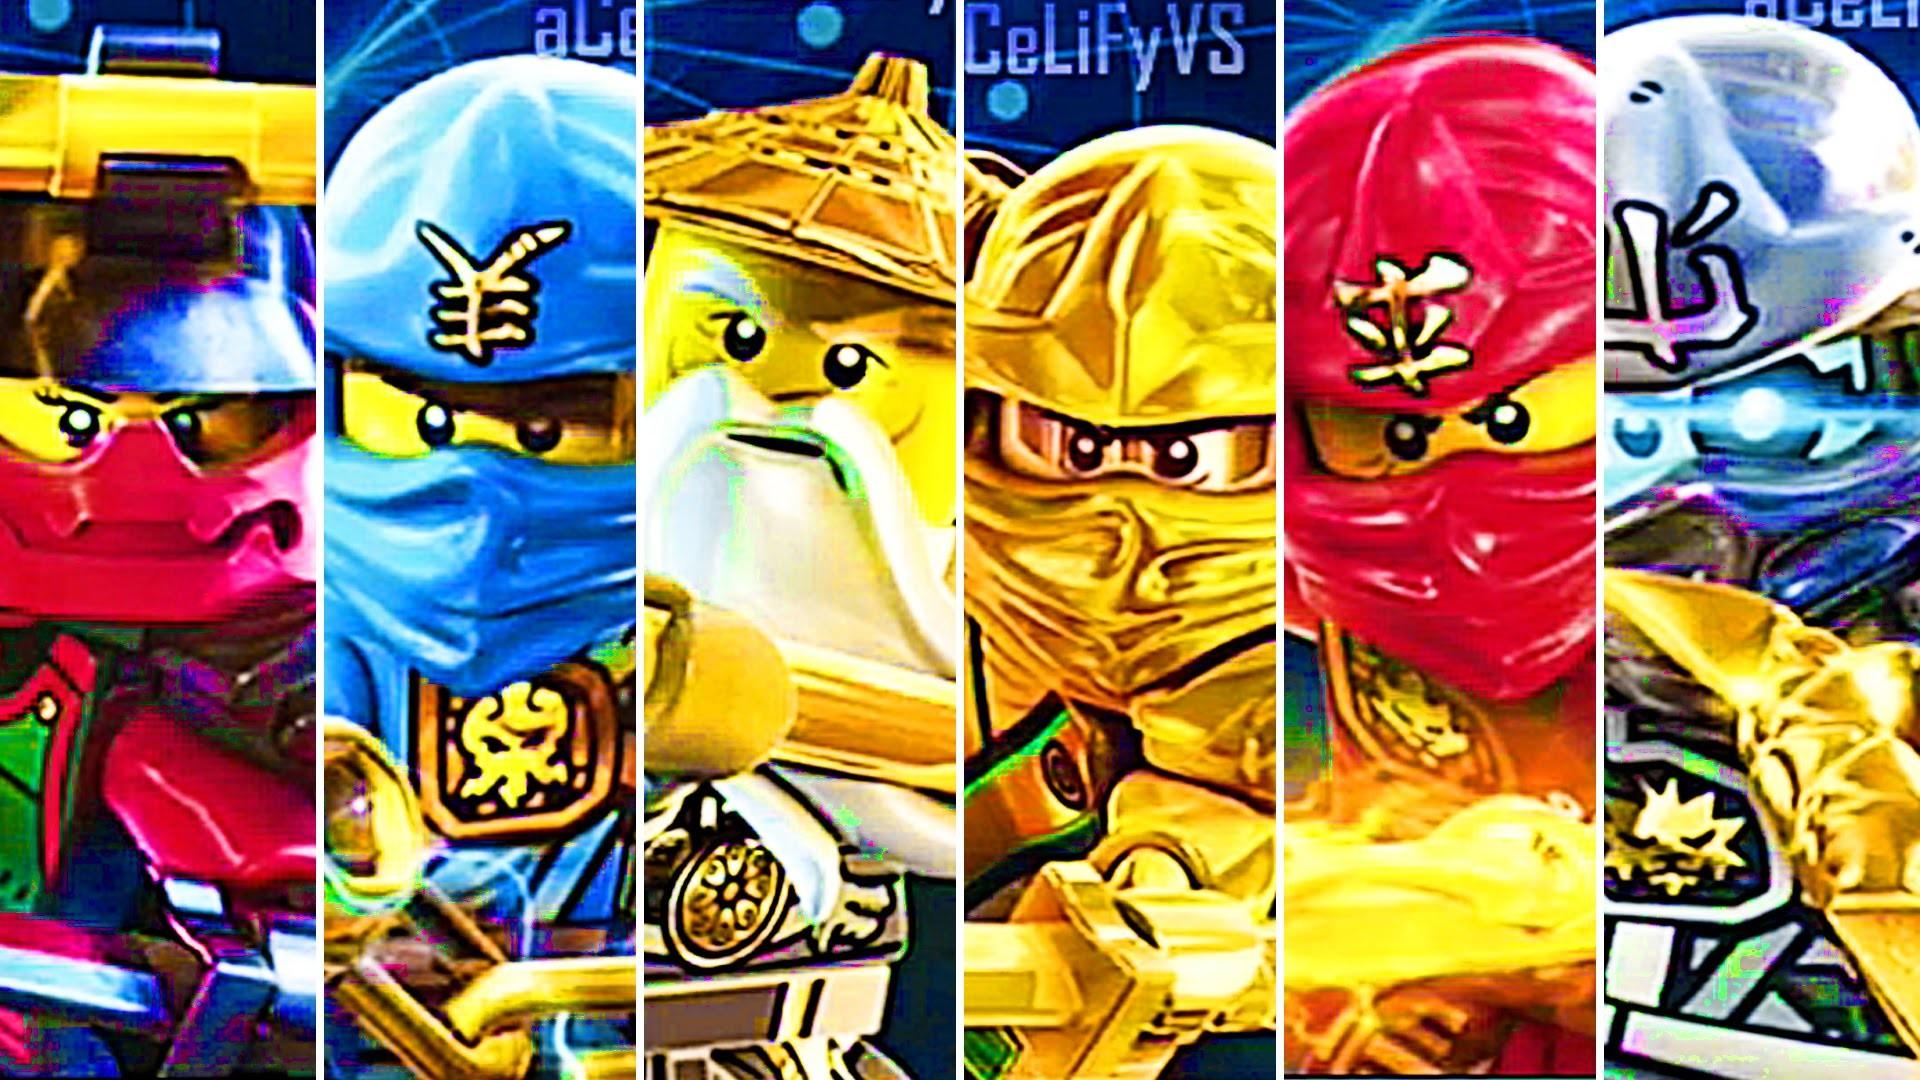 Quizz ninjago saison 3 sur 4 quiz dessins anim s - Ninjago saison 2 ...